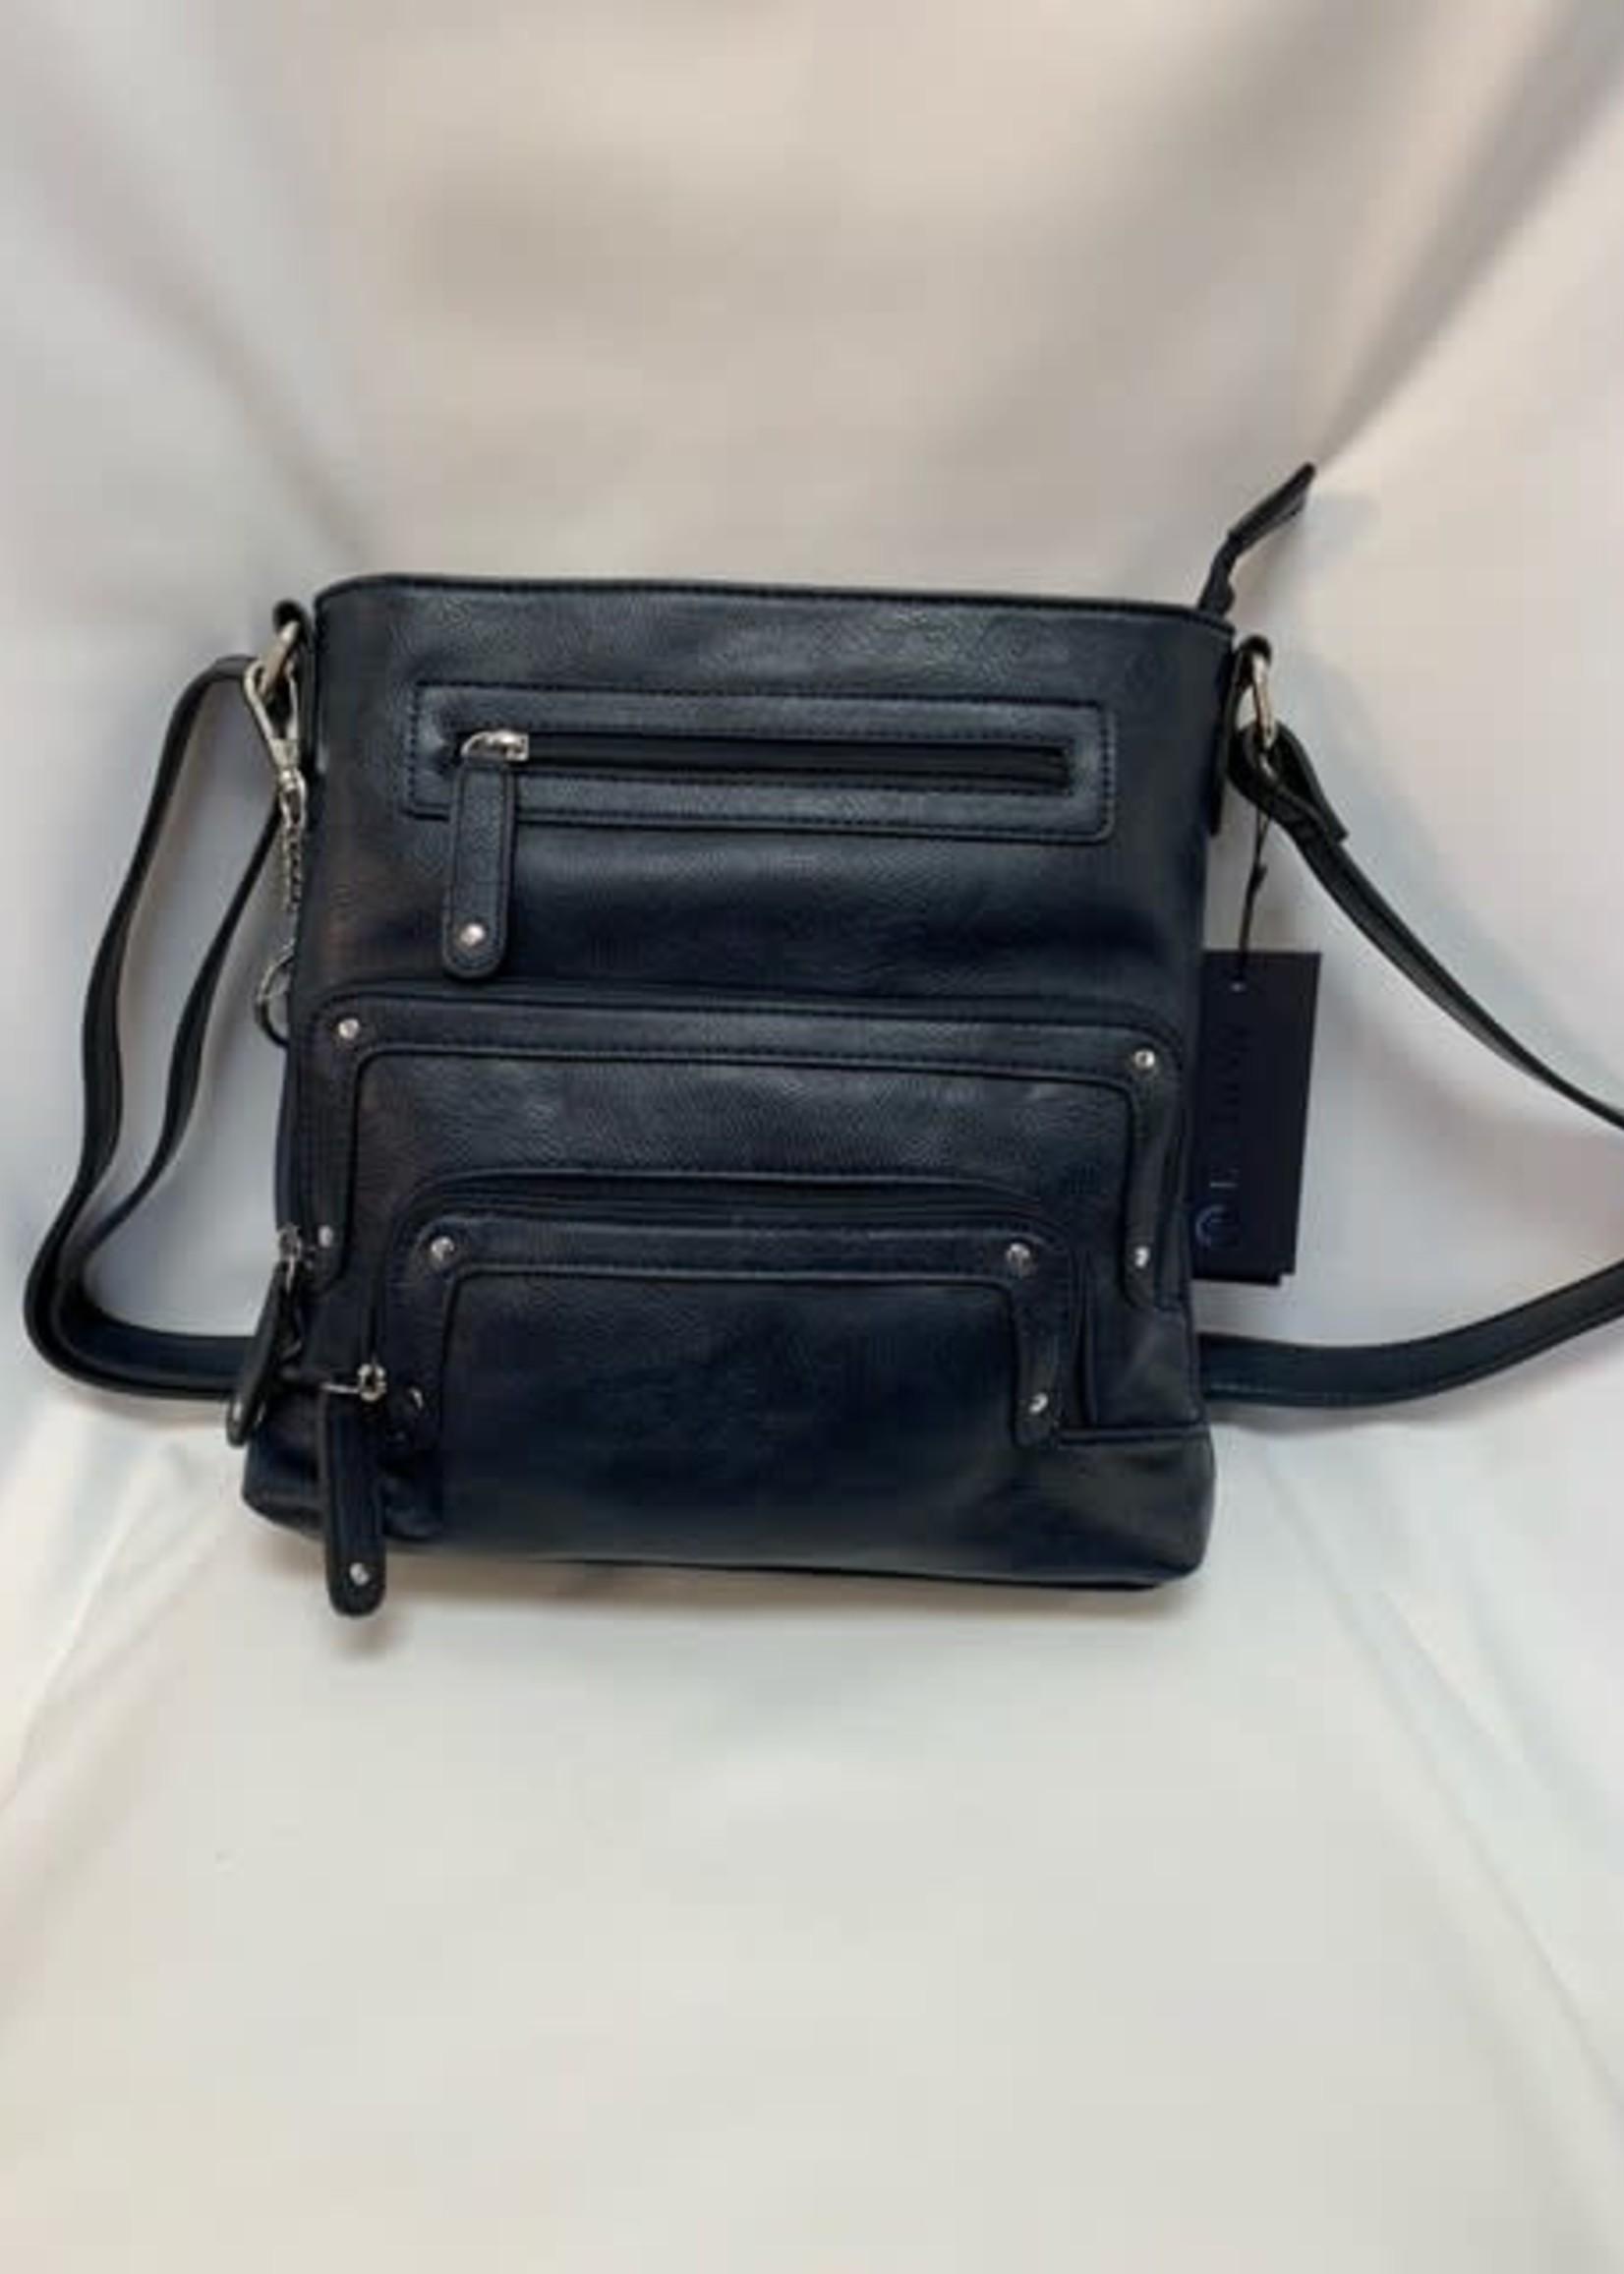 La Diva crossbody purse